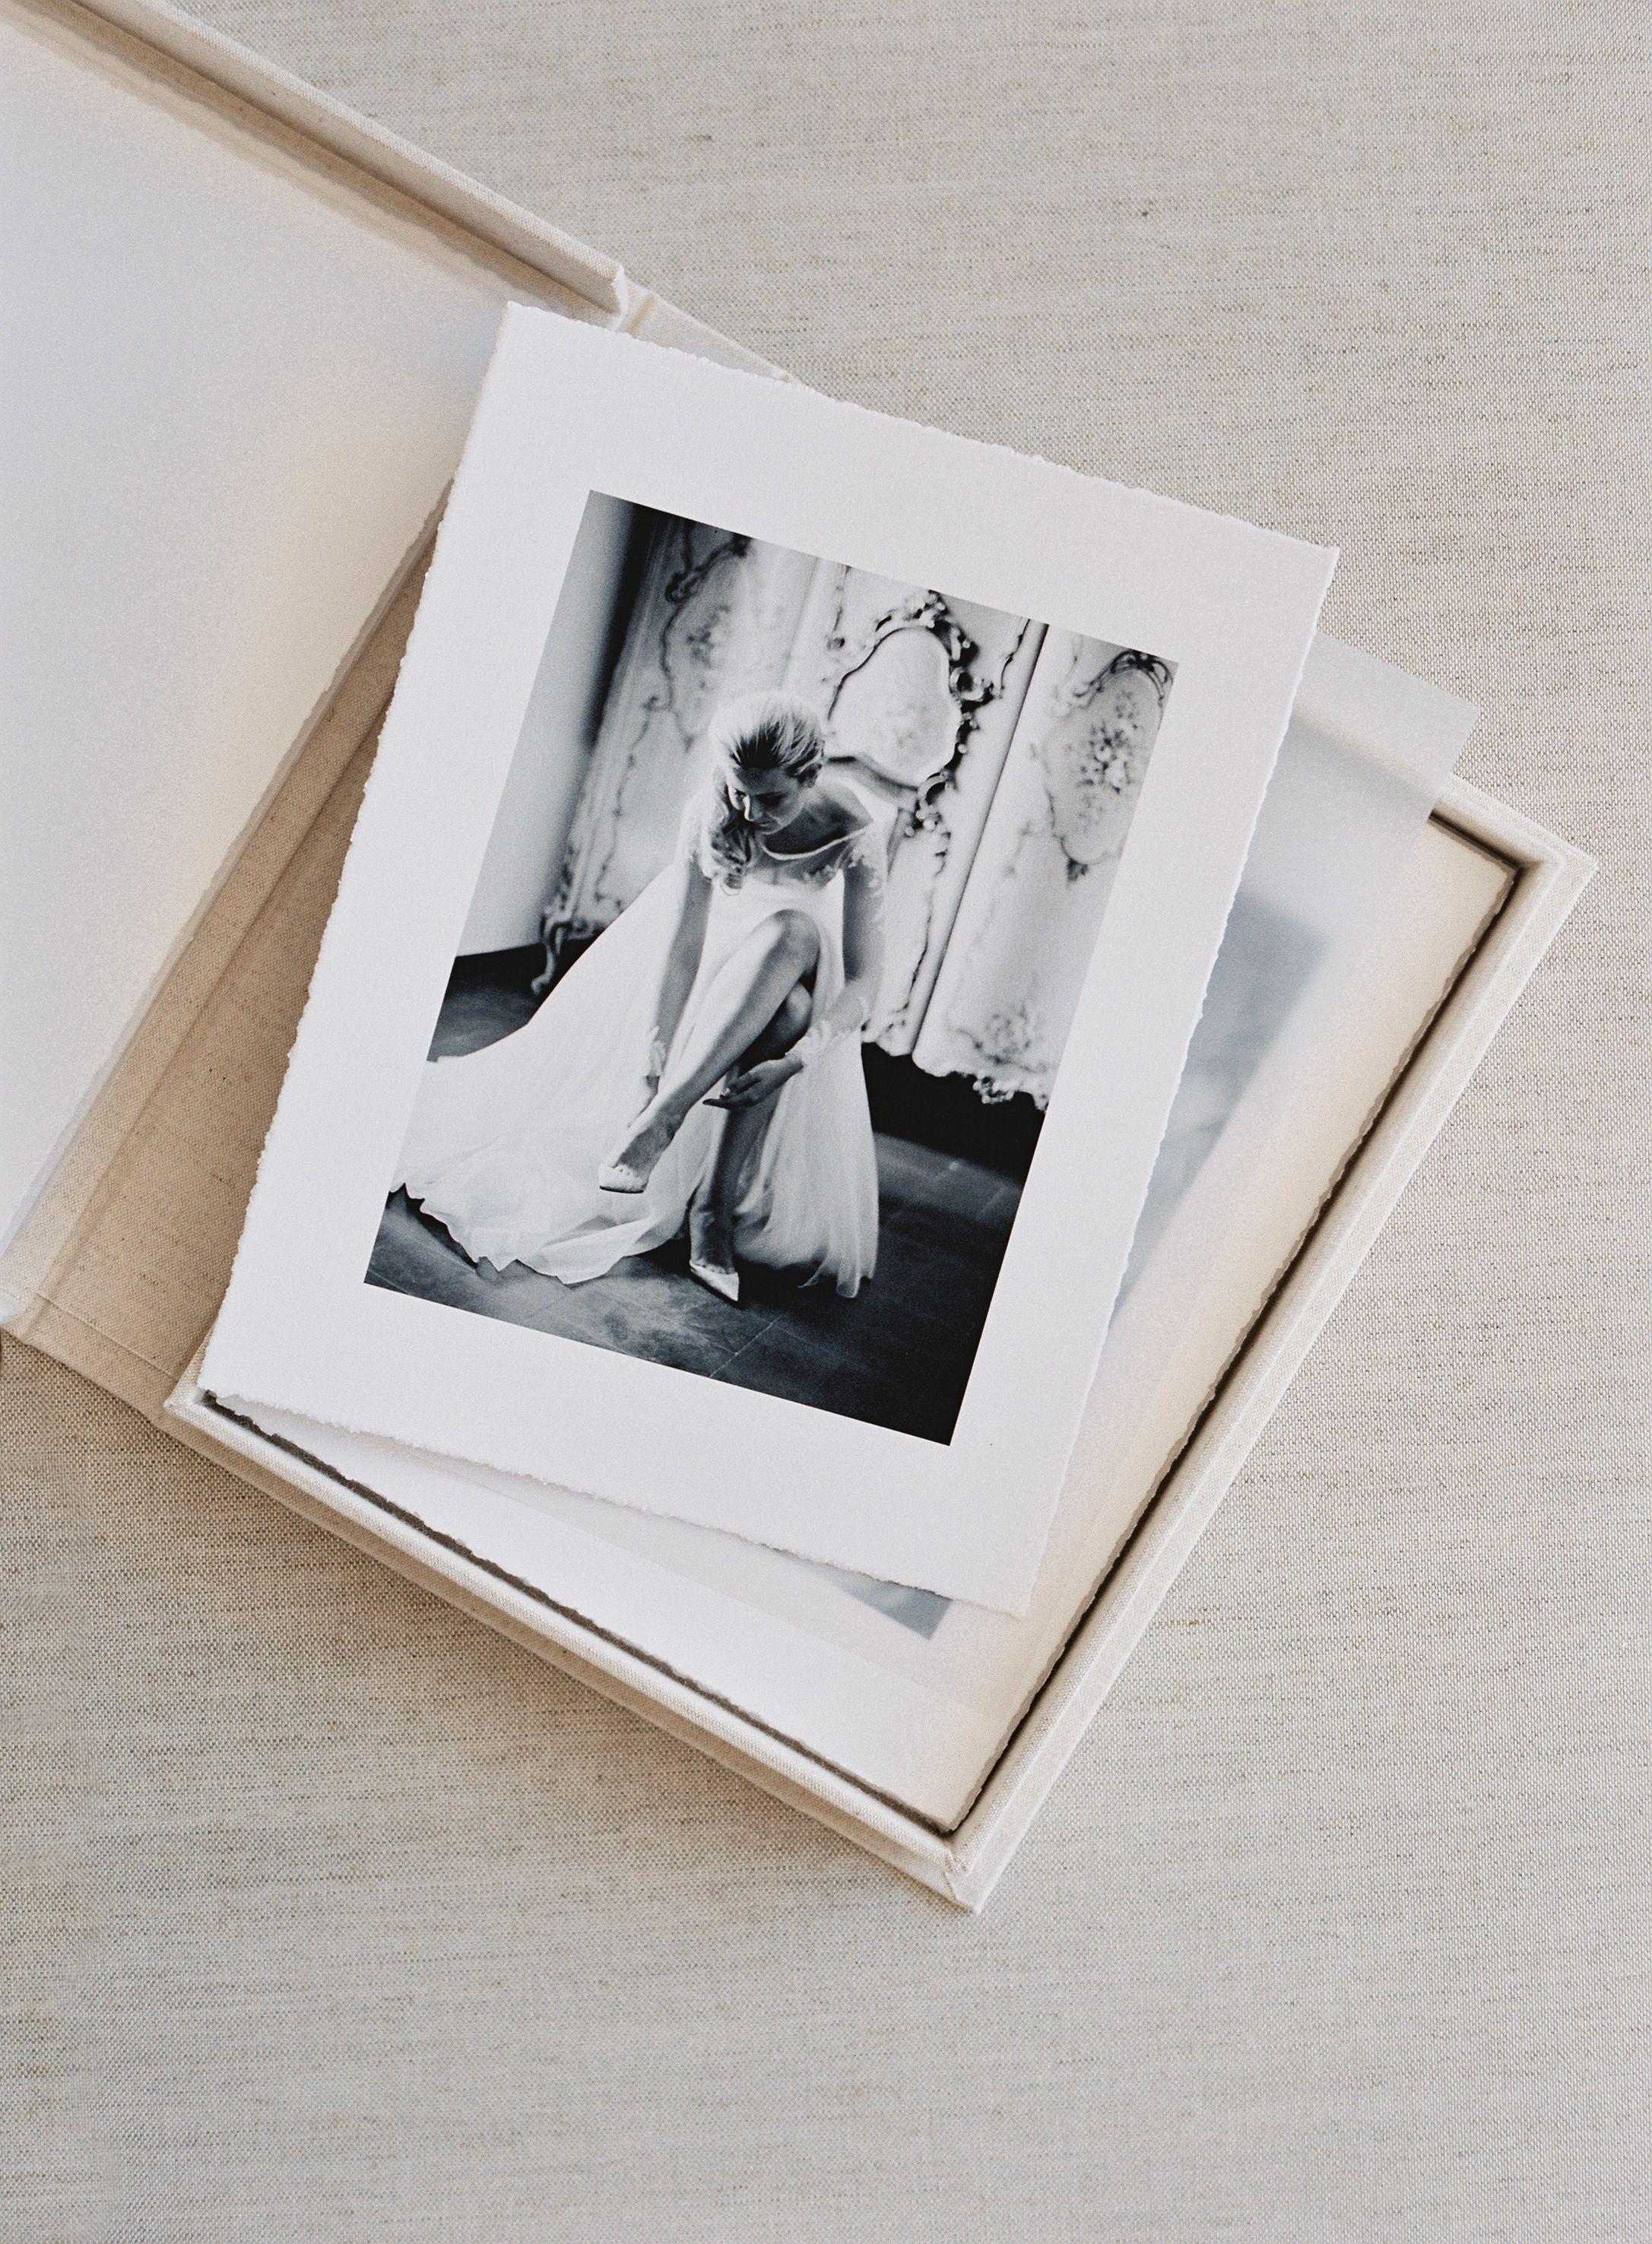 The unbound folio album photo prints pinterest album wedding